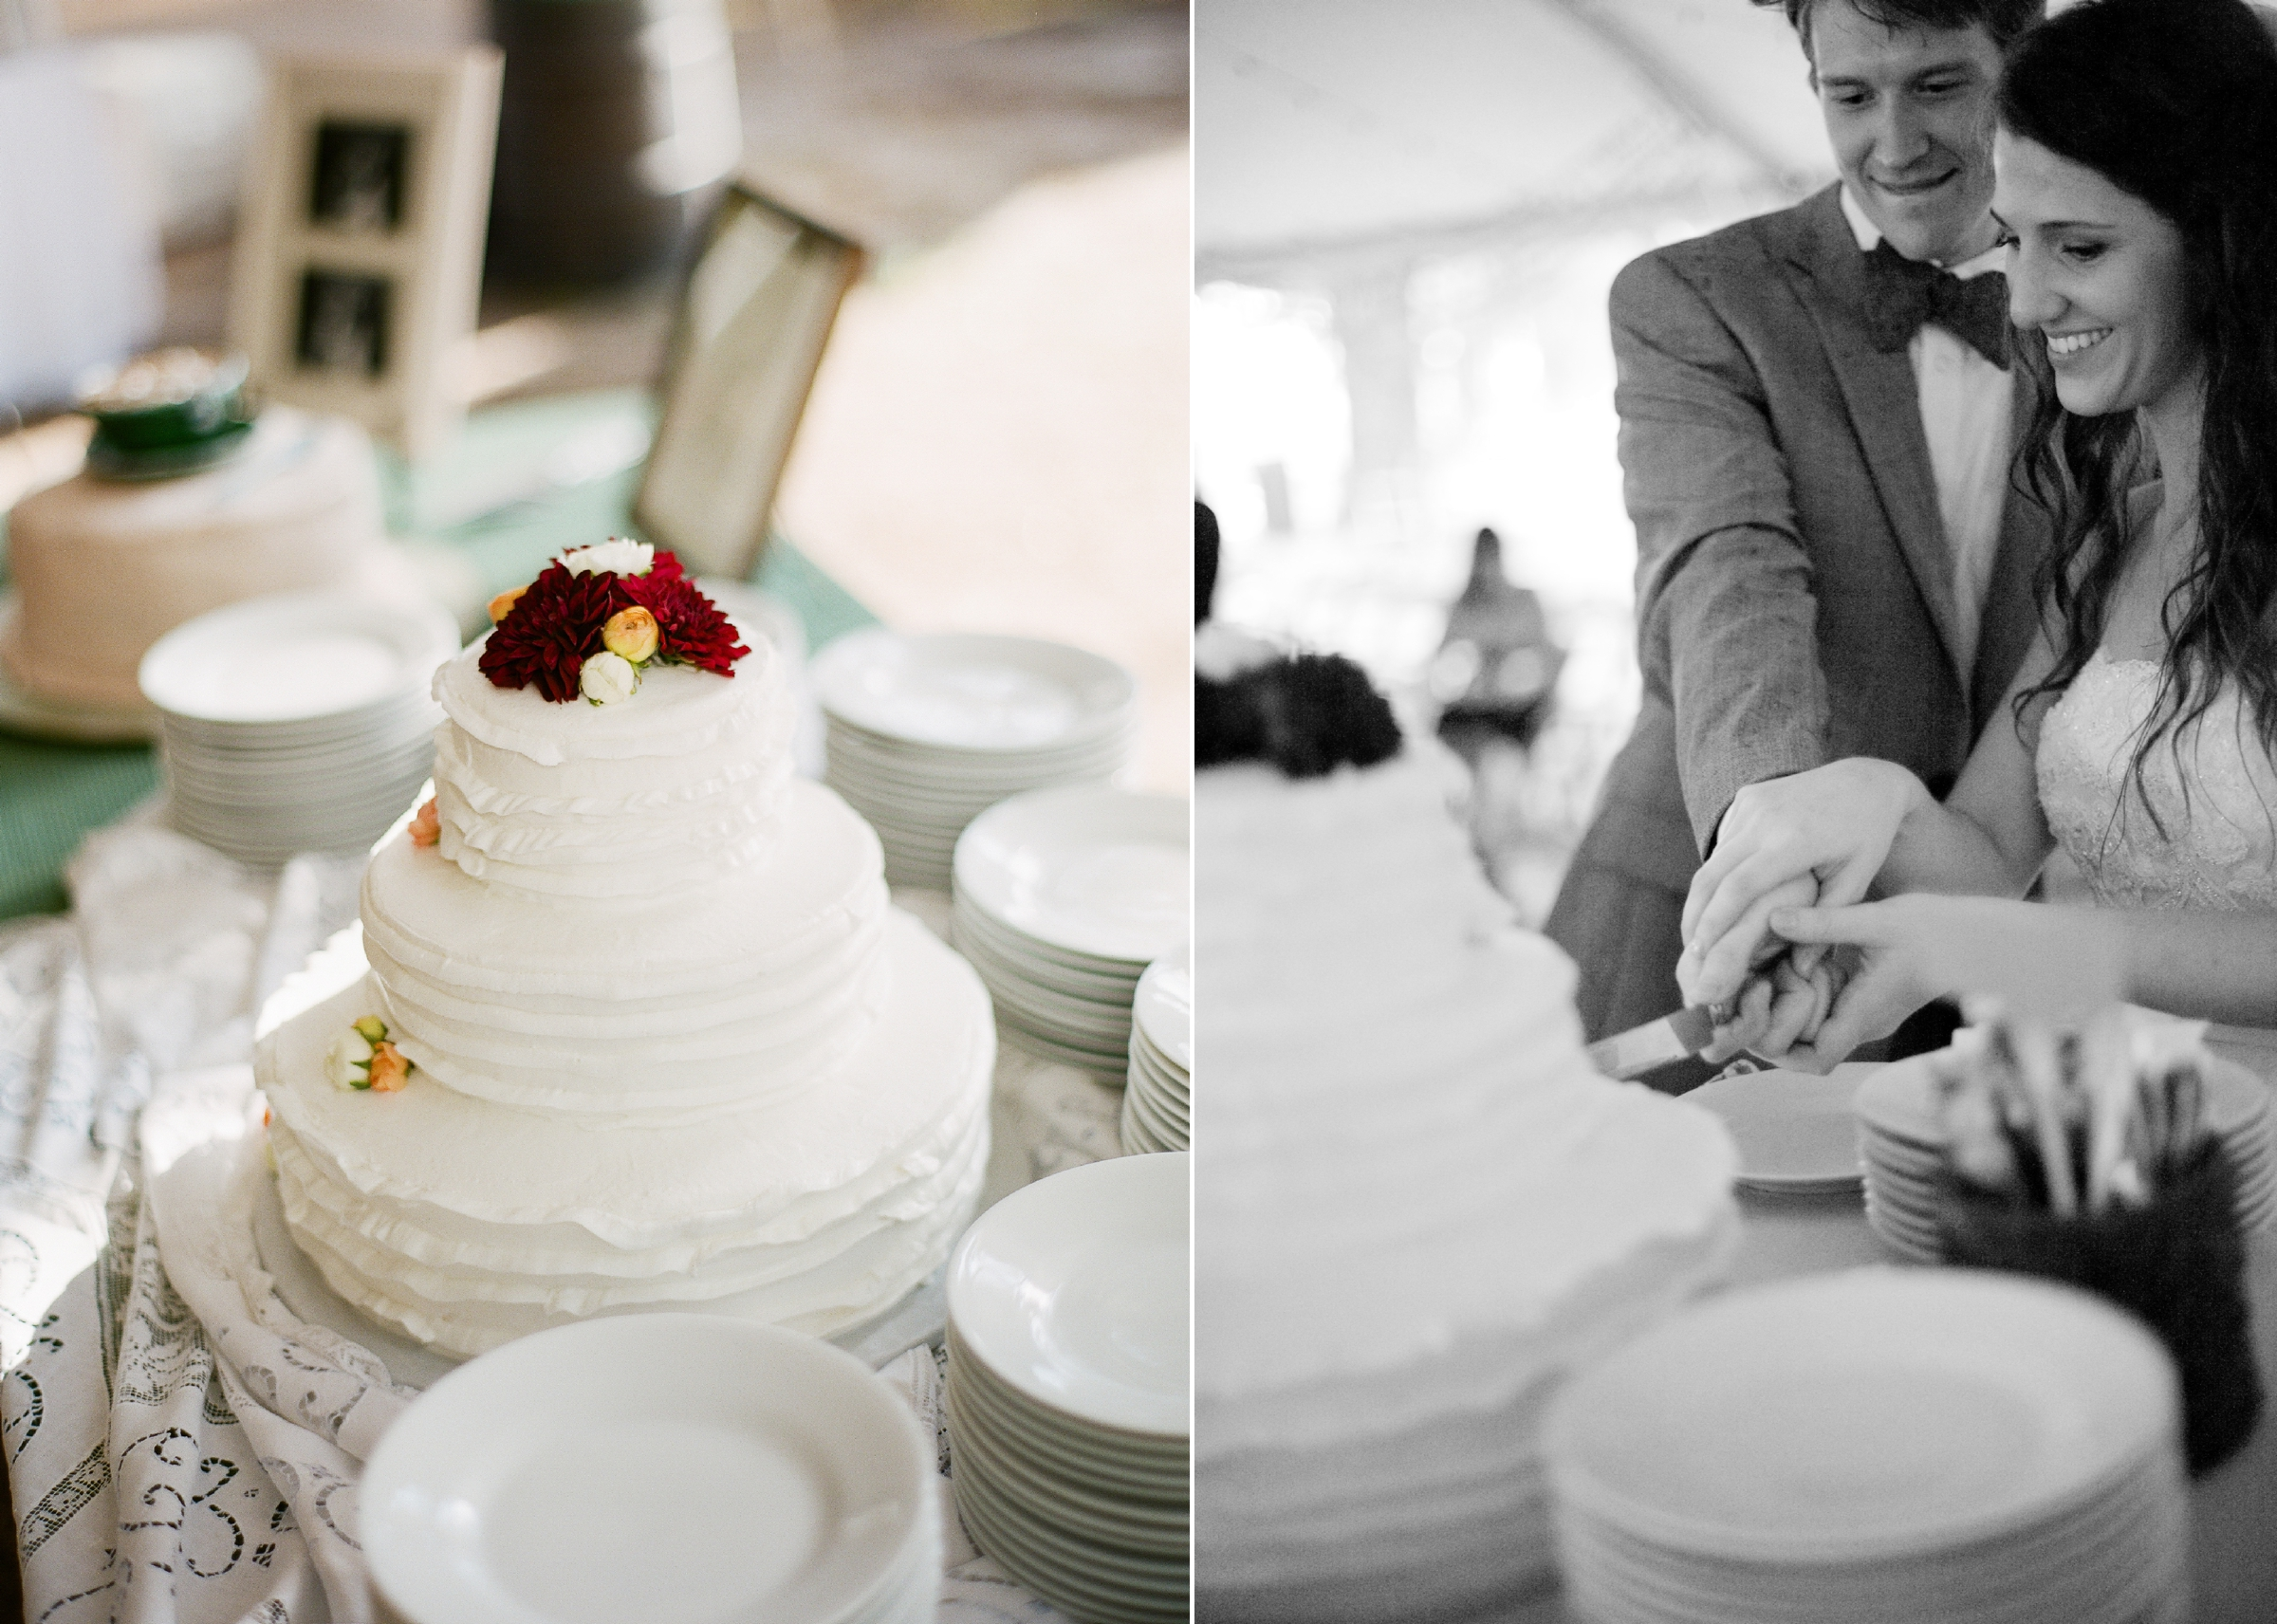 st_simons_island_wedding_photographer_shannon_griffin_0029.jpg